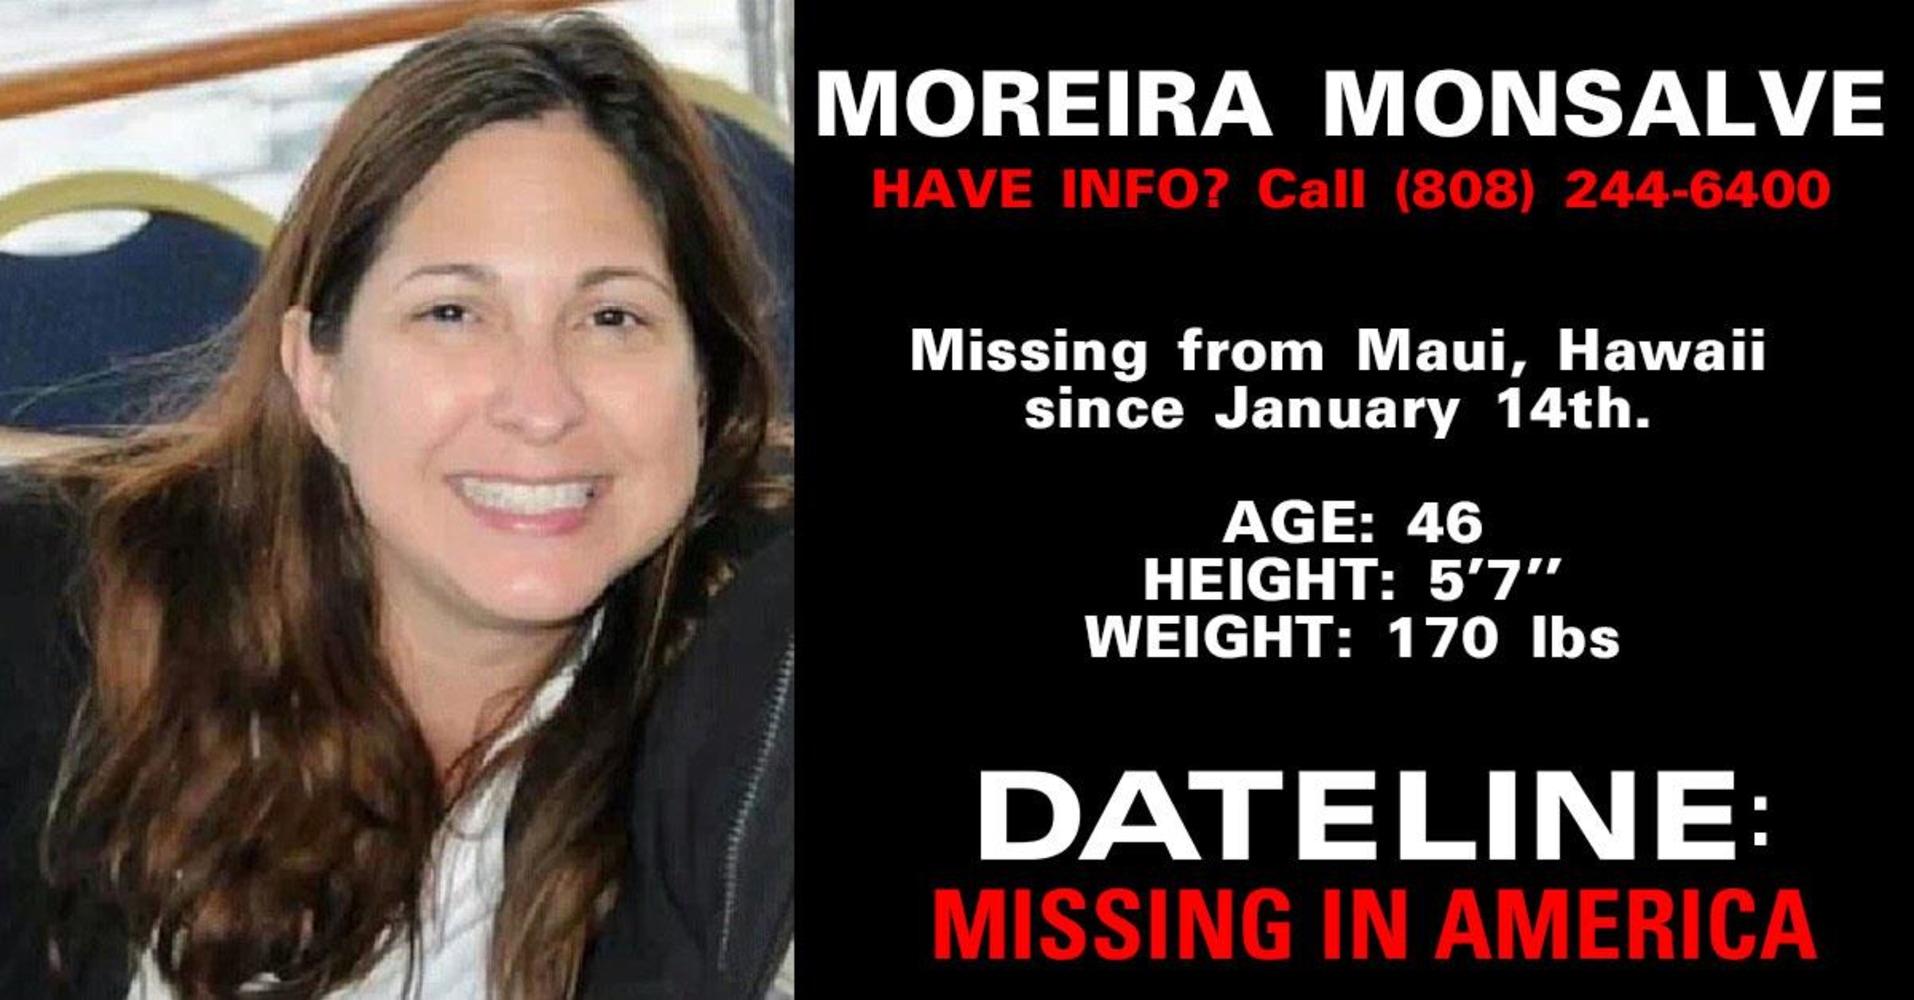 MISSING IN AMERICA: Moreira